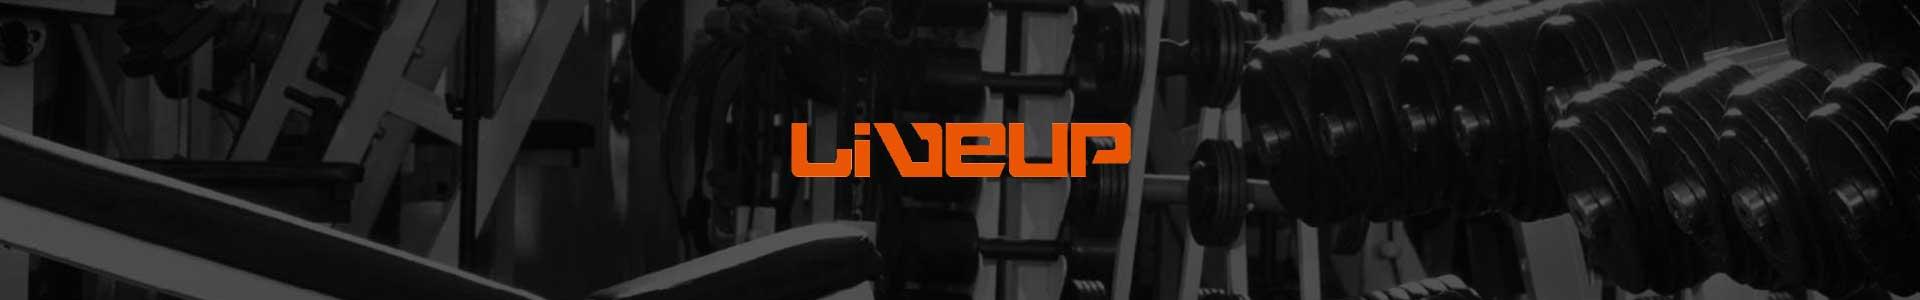 Budopunkt – Liveup Fitness